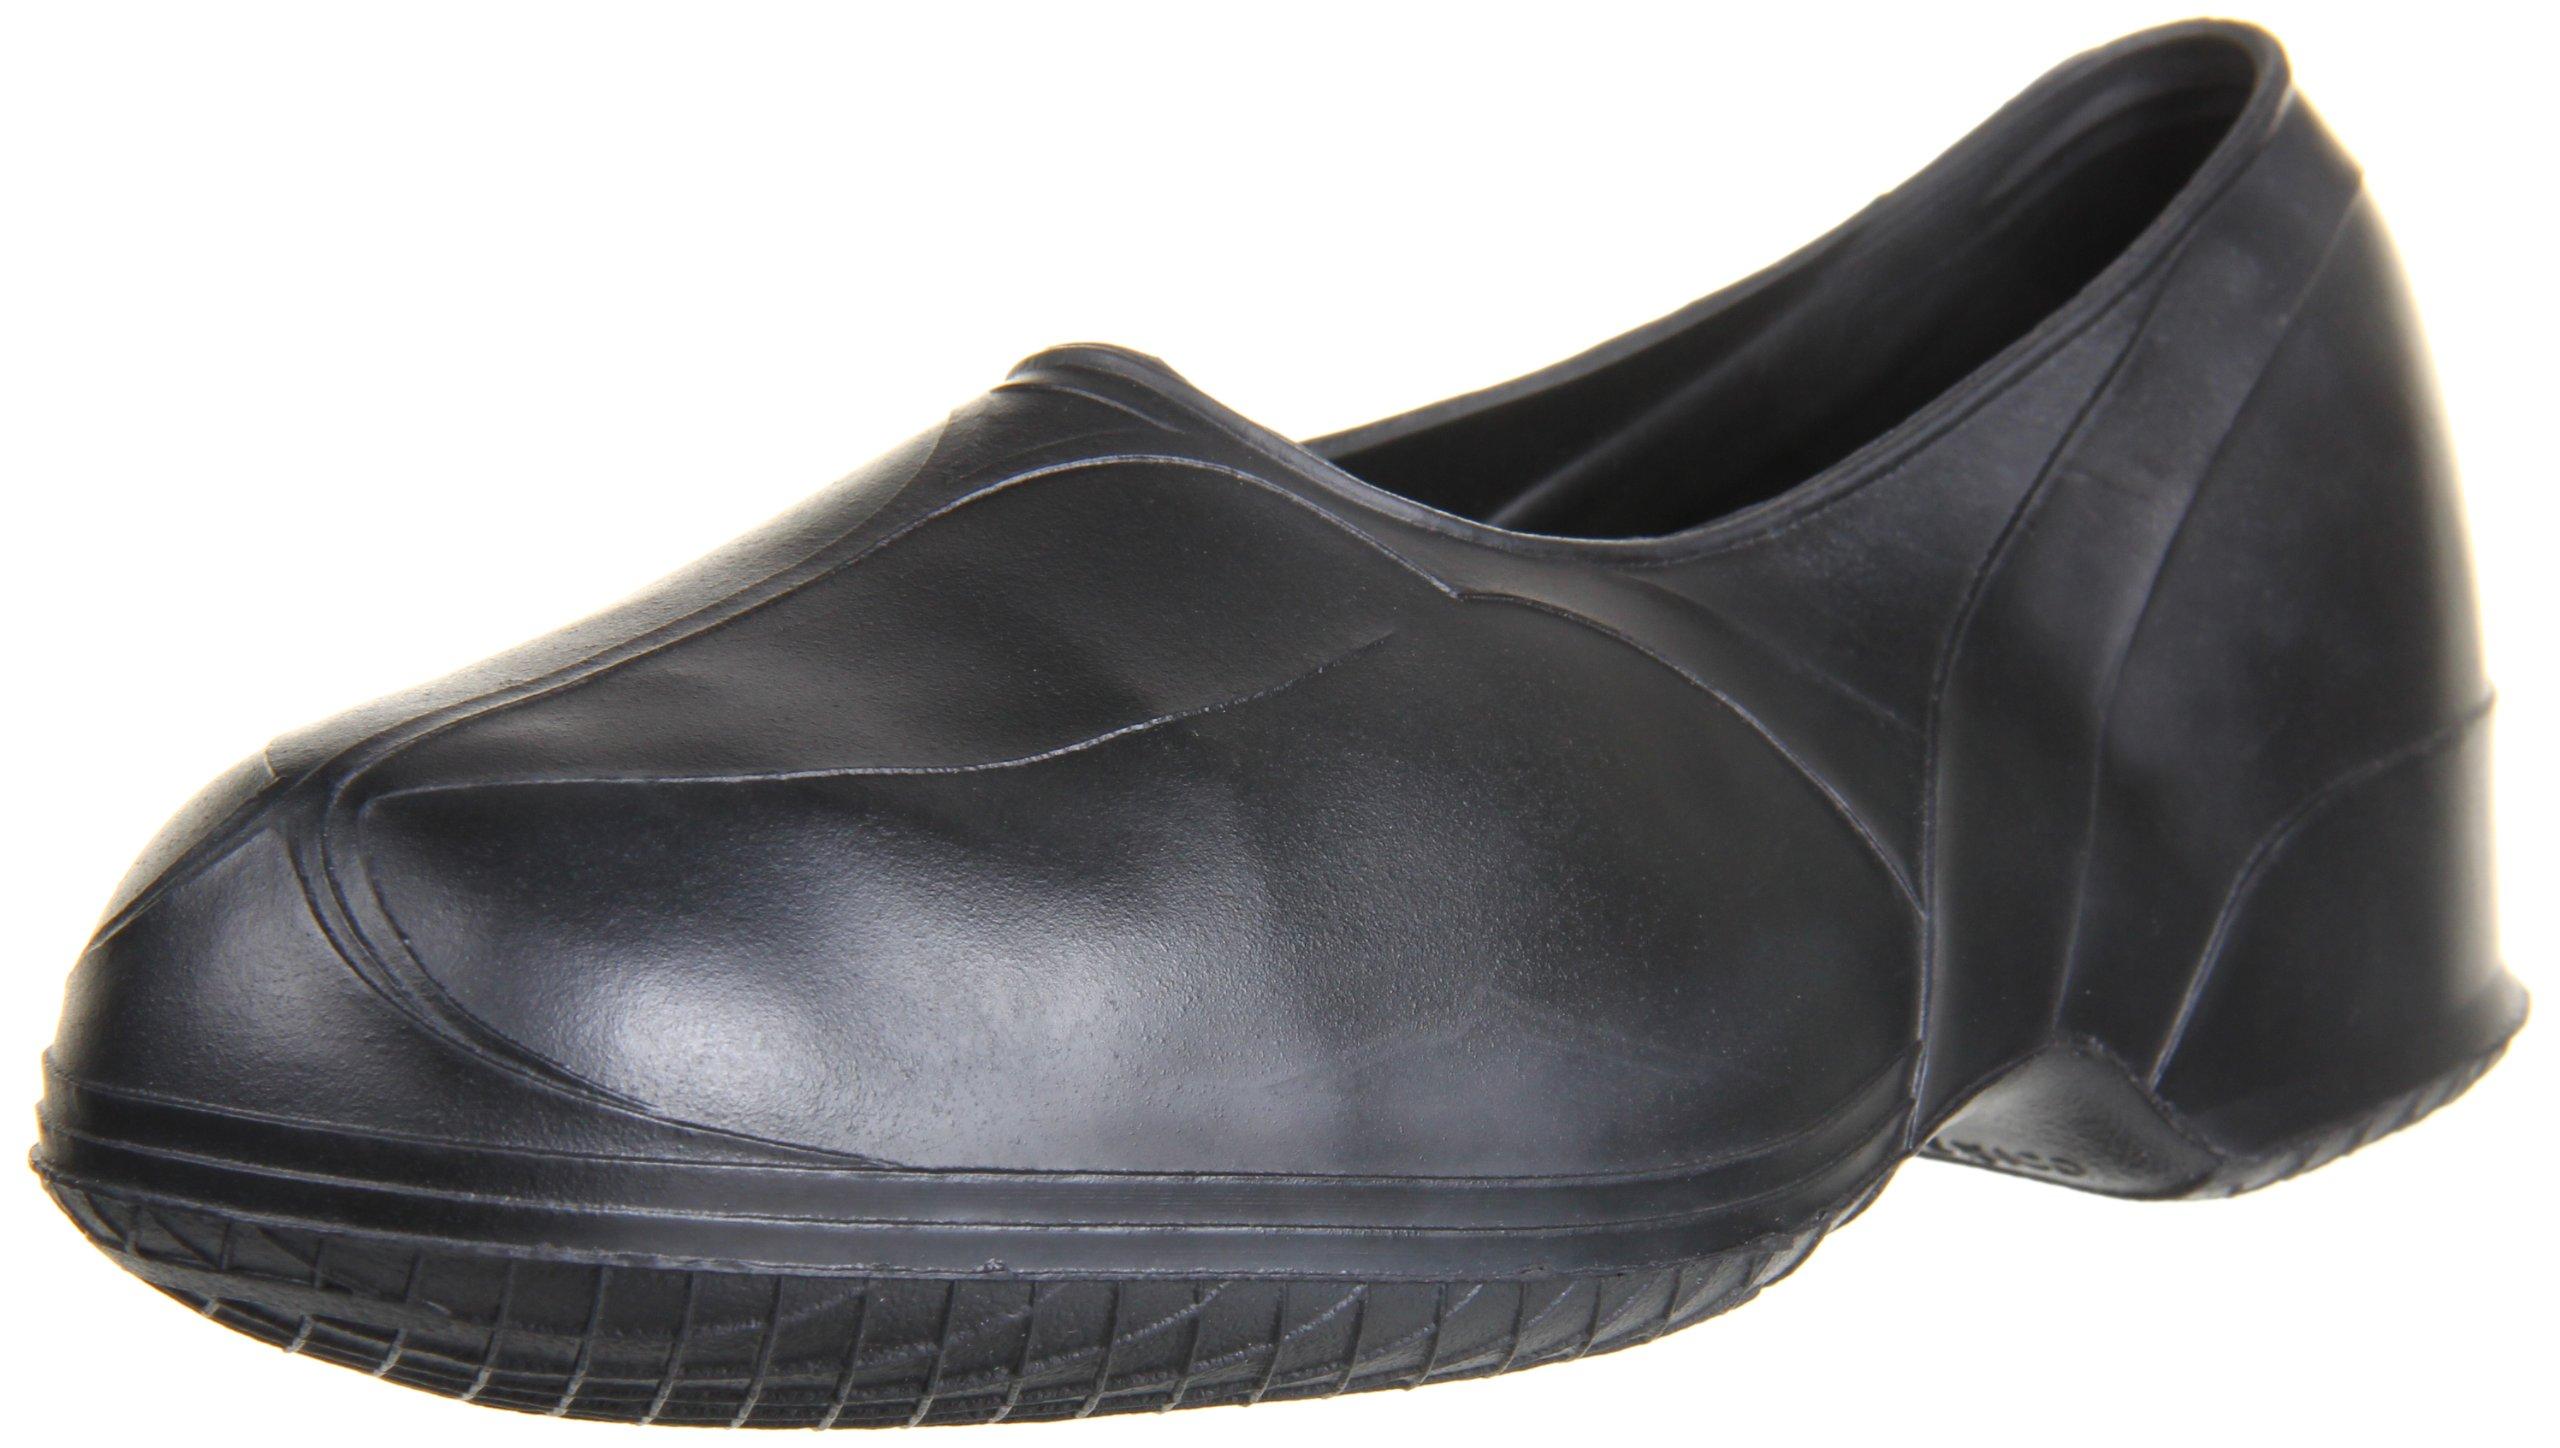 Women's Galoshes - Waterproof Rain Overshoes by Tingley